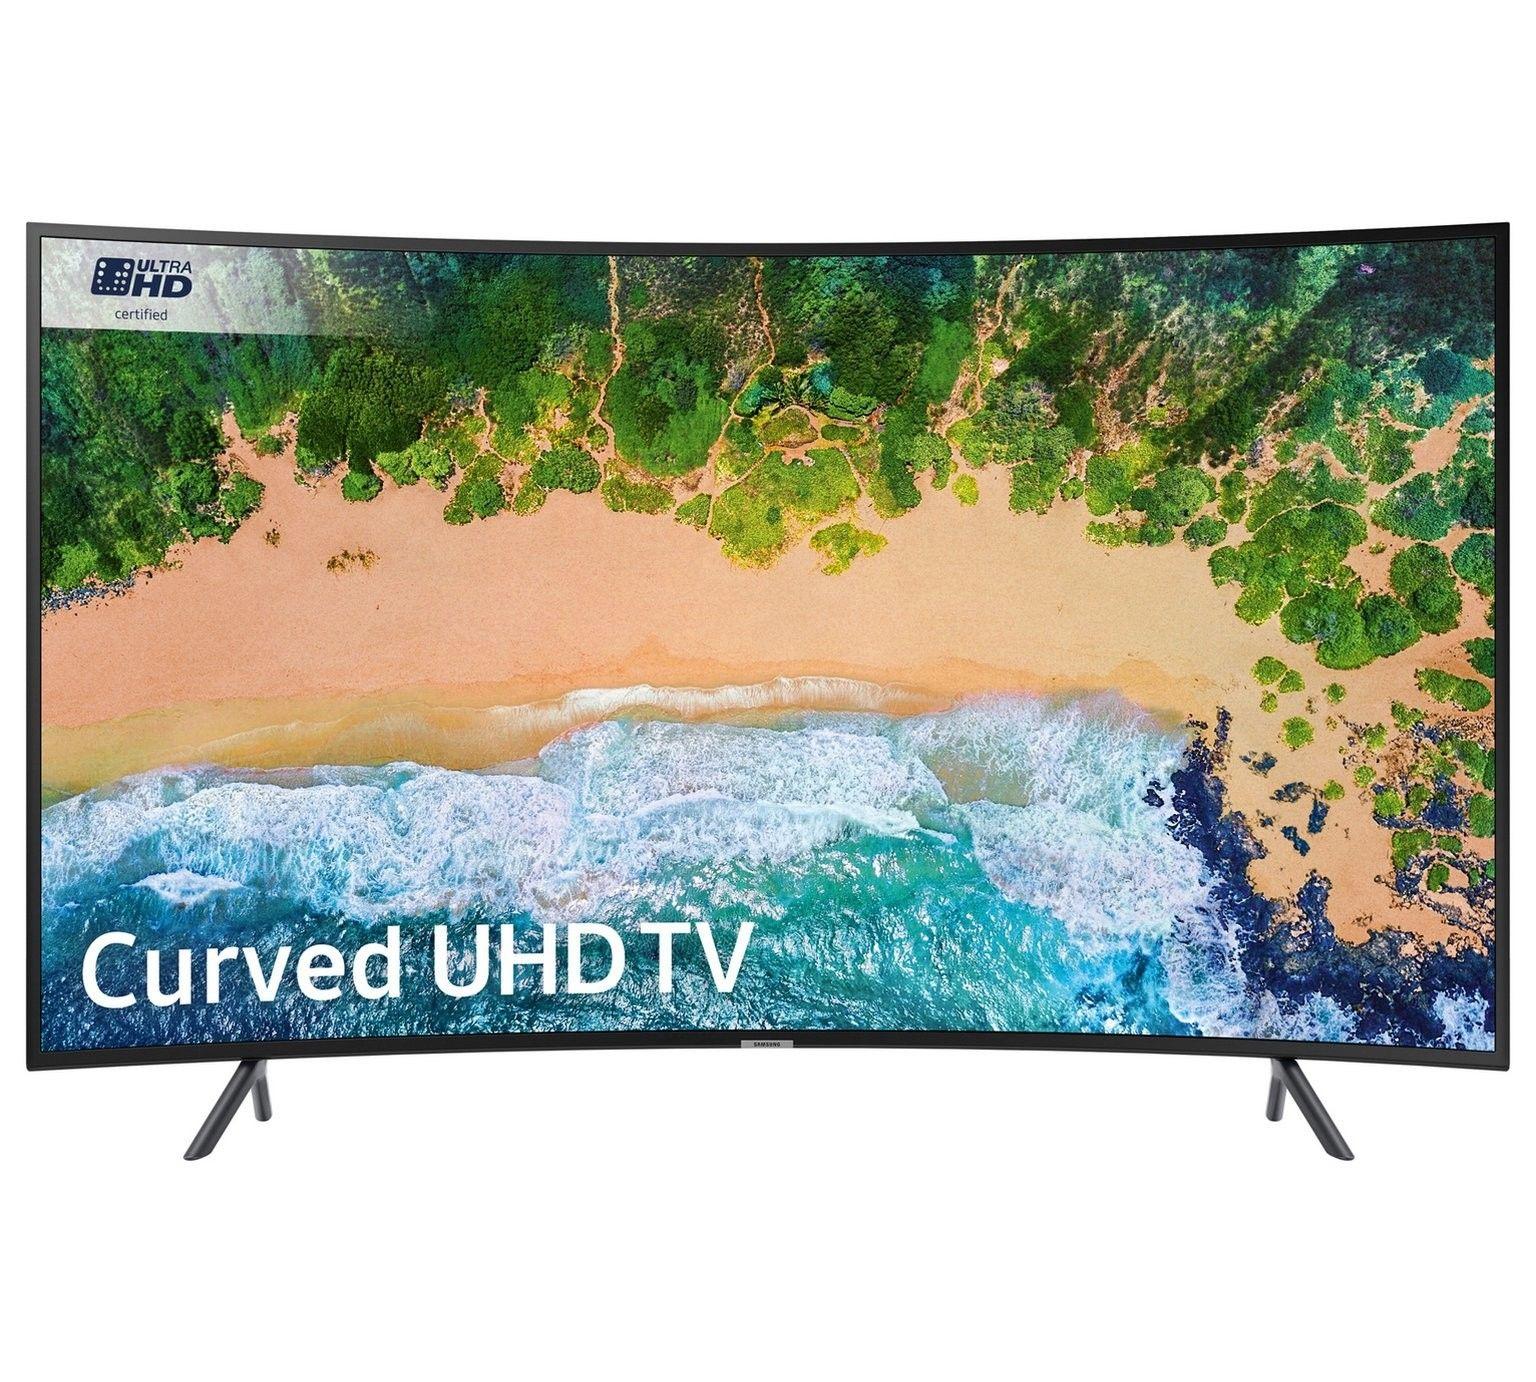 Refurbished Samsung UE49NU7300KXXU 49 Inch Curved 4K Ultra HD HDR Smart WiFi LED TV, £344.99 at Argos/ebay